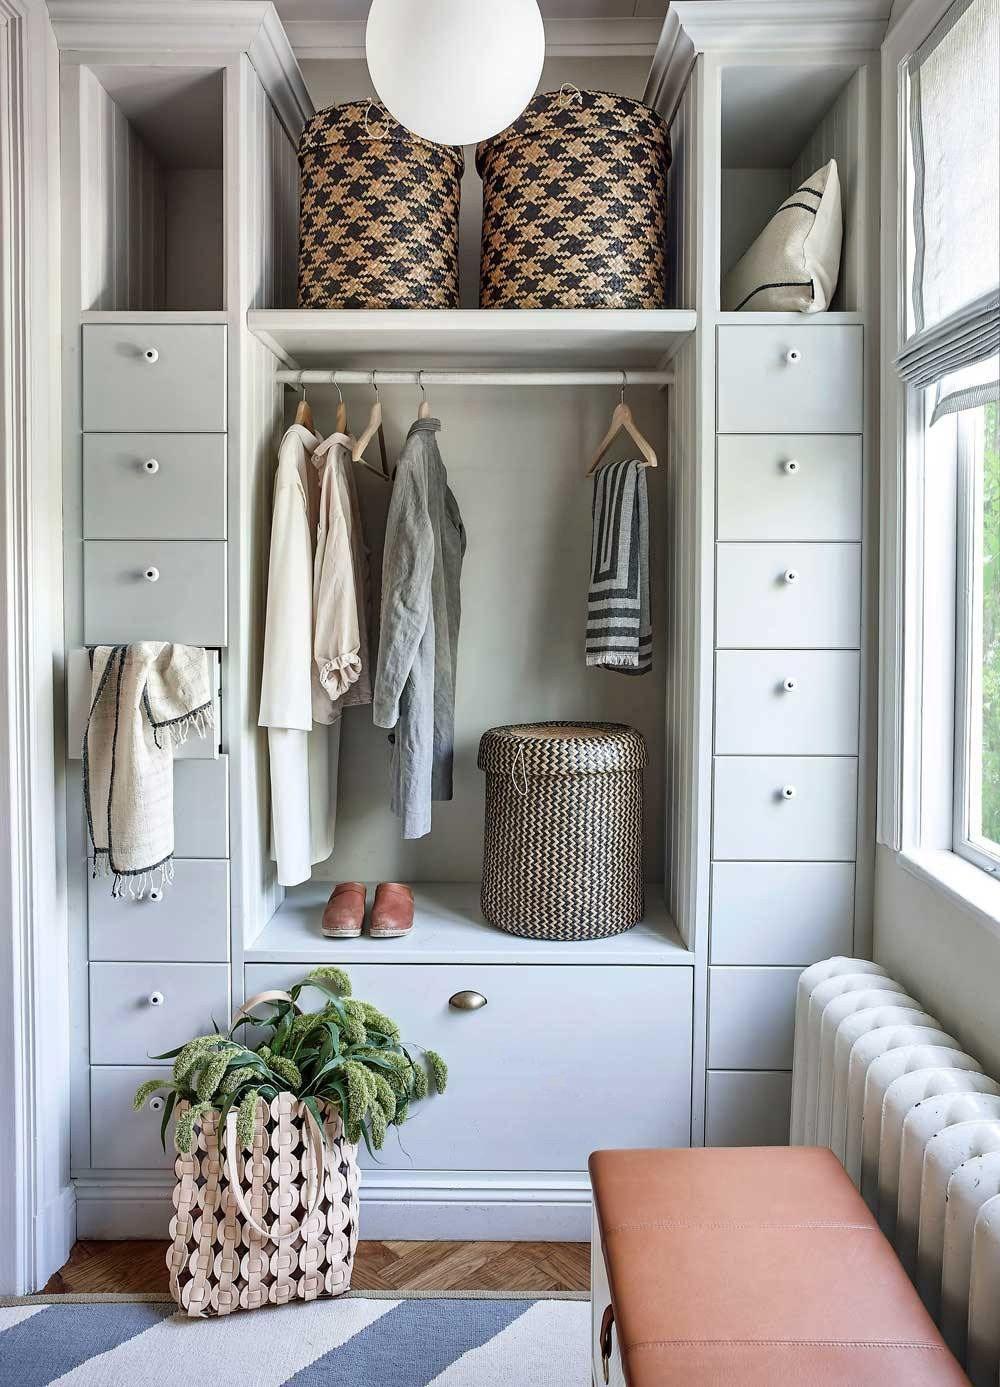 10 Pins Pinterest Inspiration Room For Tuesday Blog Bedroom Closet Design Closet Design Interior